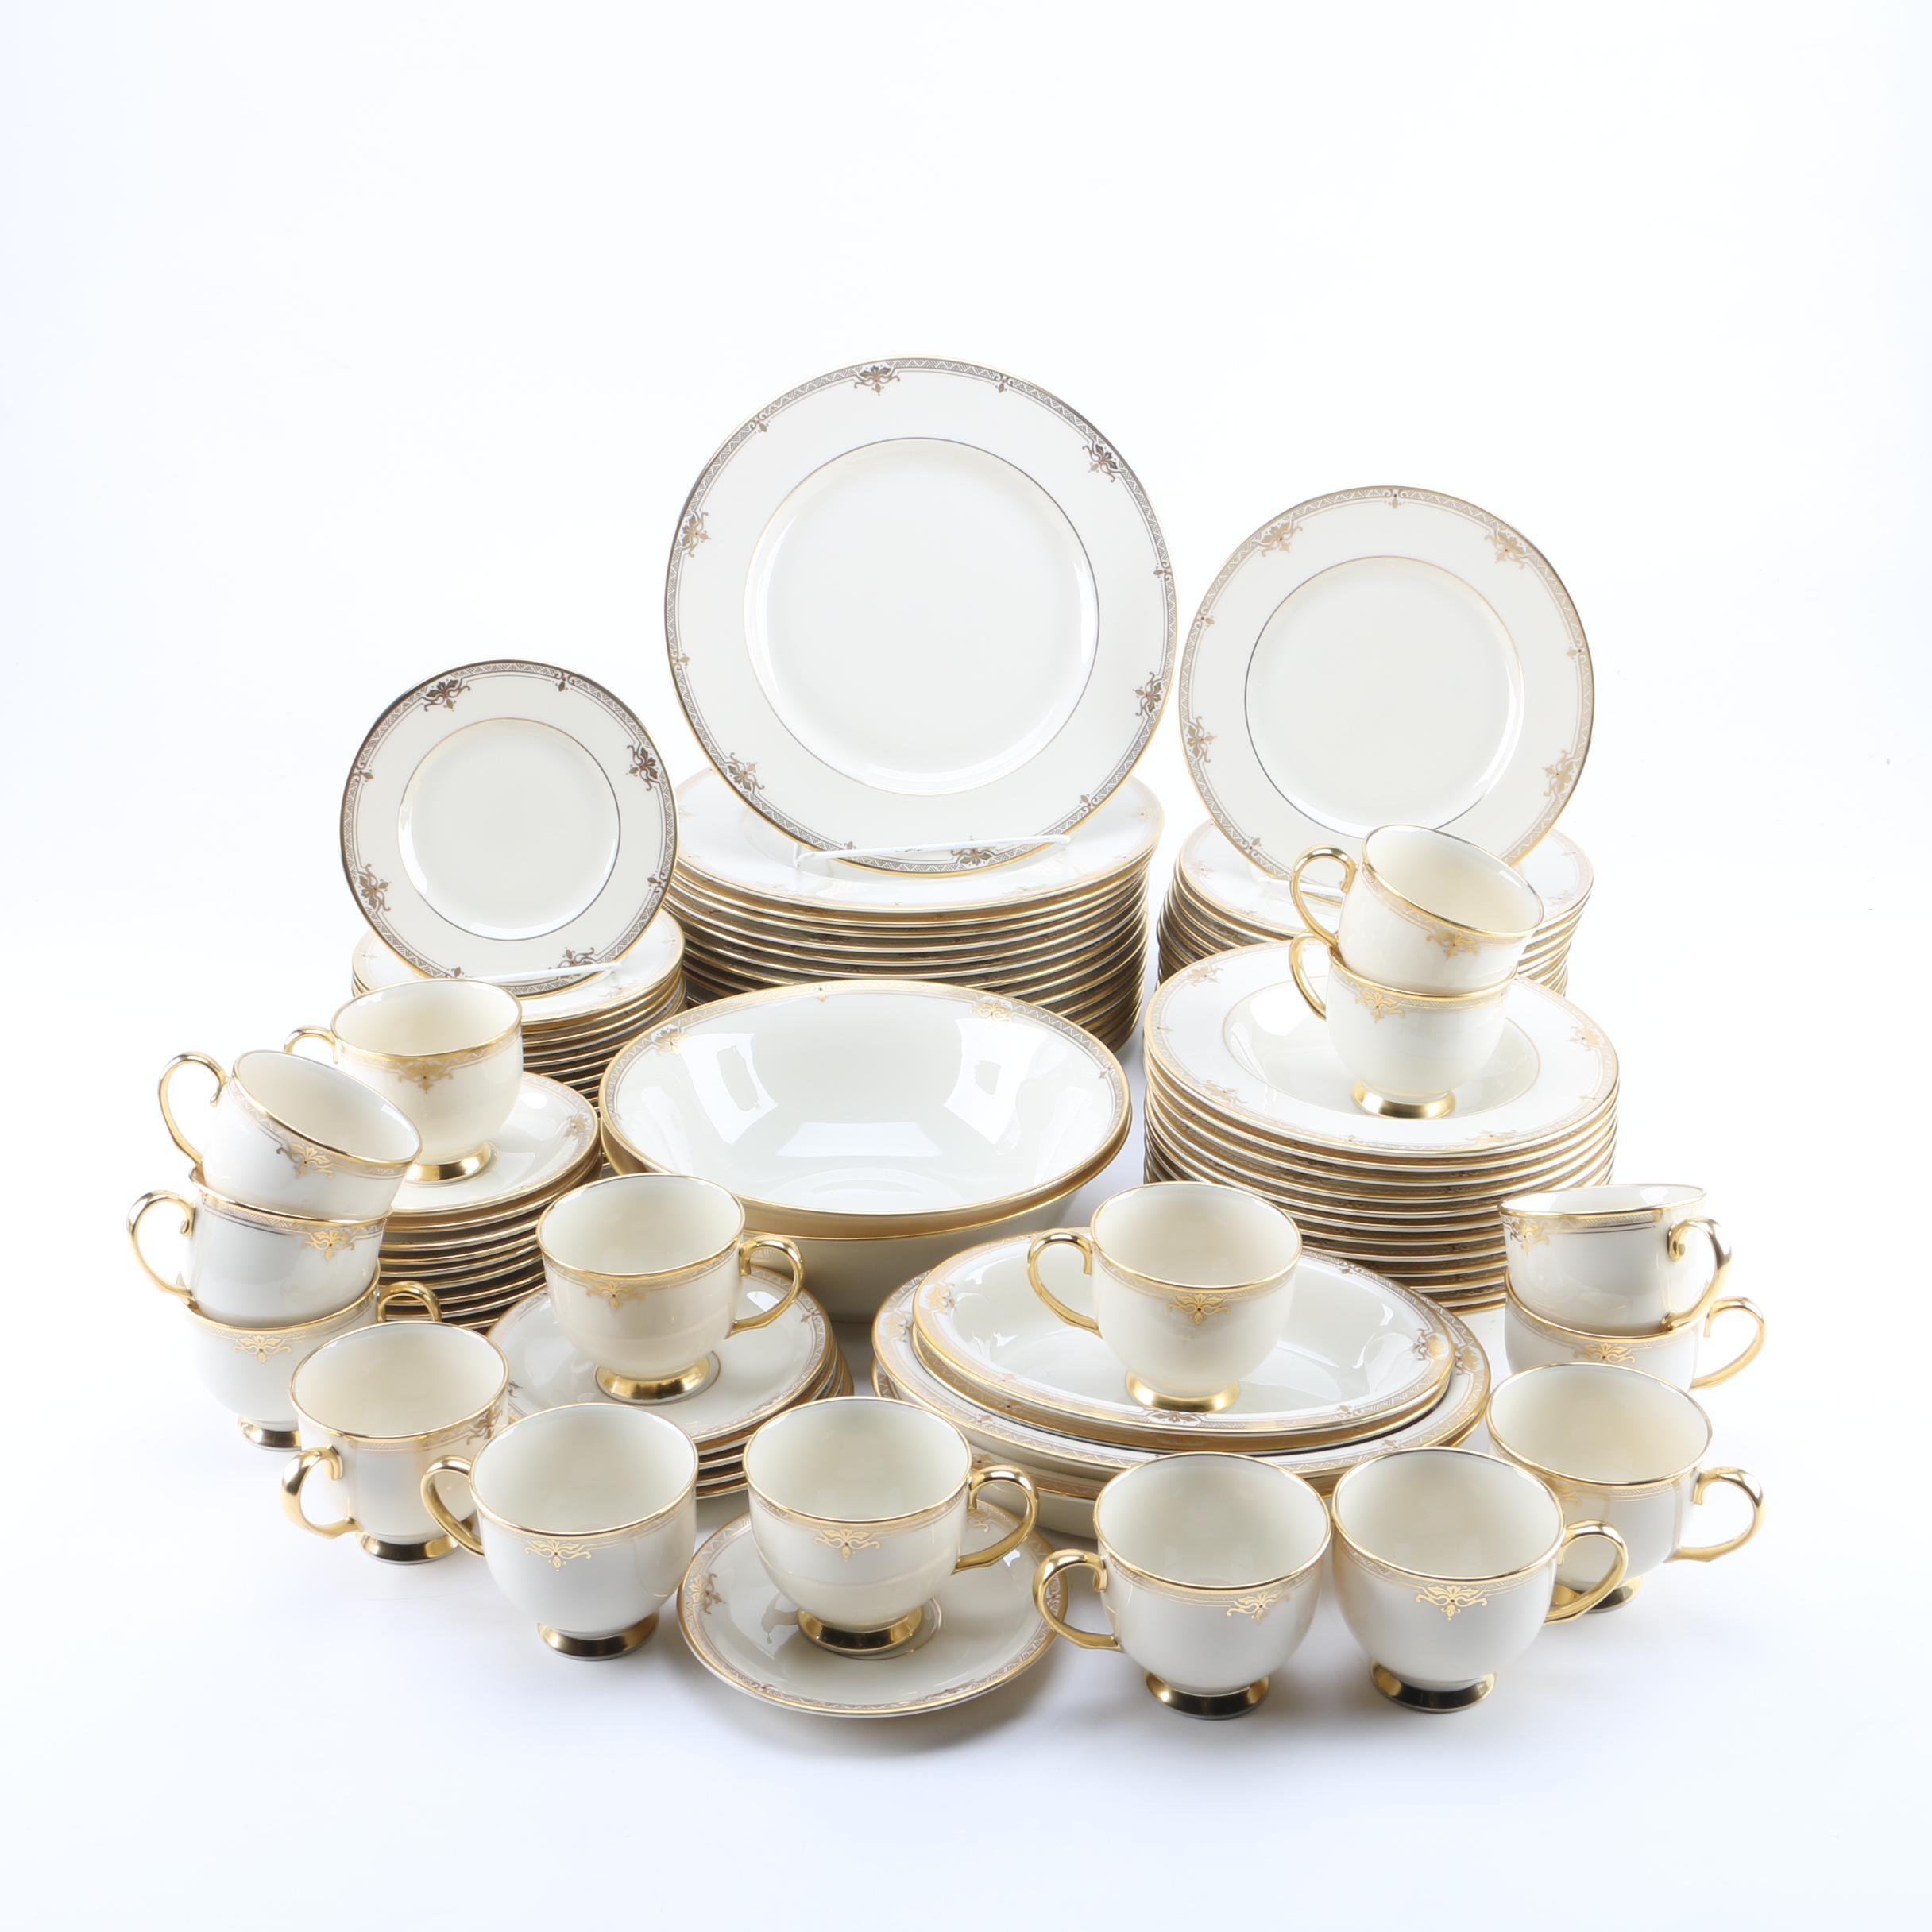 Lenox  Republic  Porcelain Tableware ...  sc 1 st  EBTH.com & Lenox